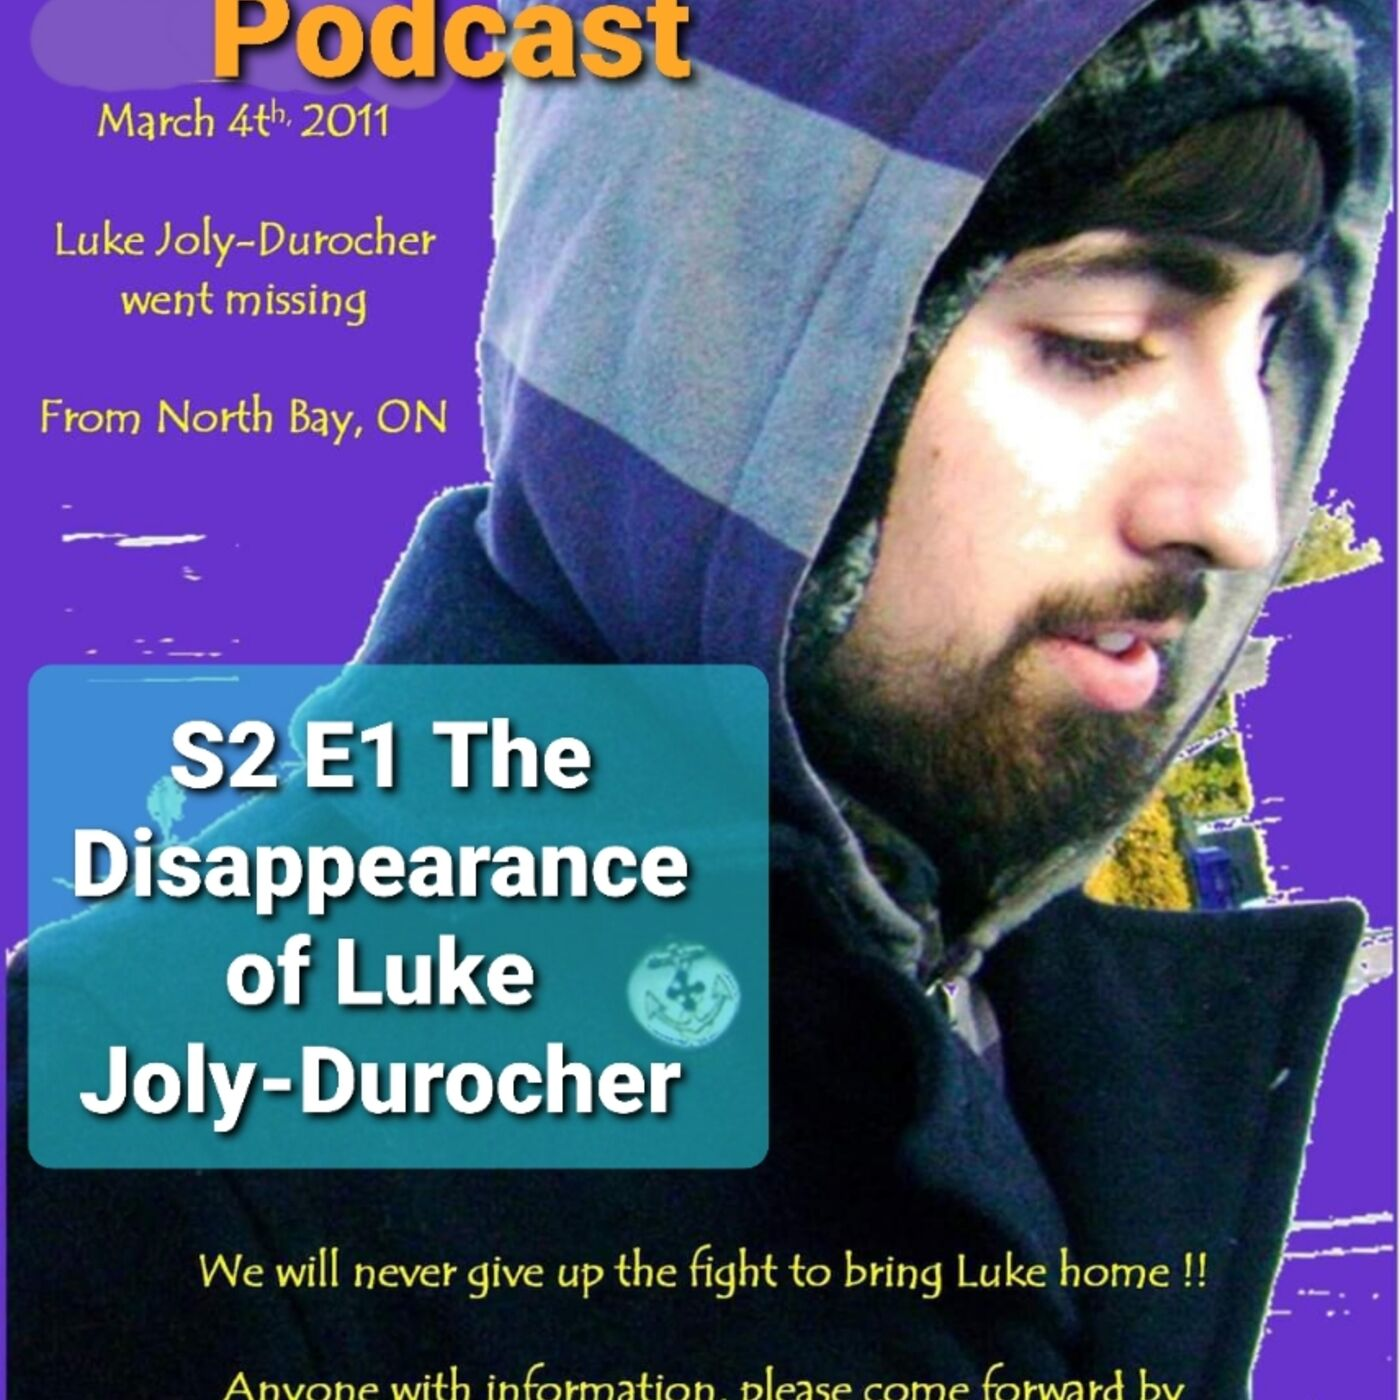 S2 E1 The Disappearance of Luke Joly-Durocher